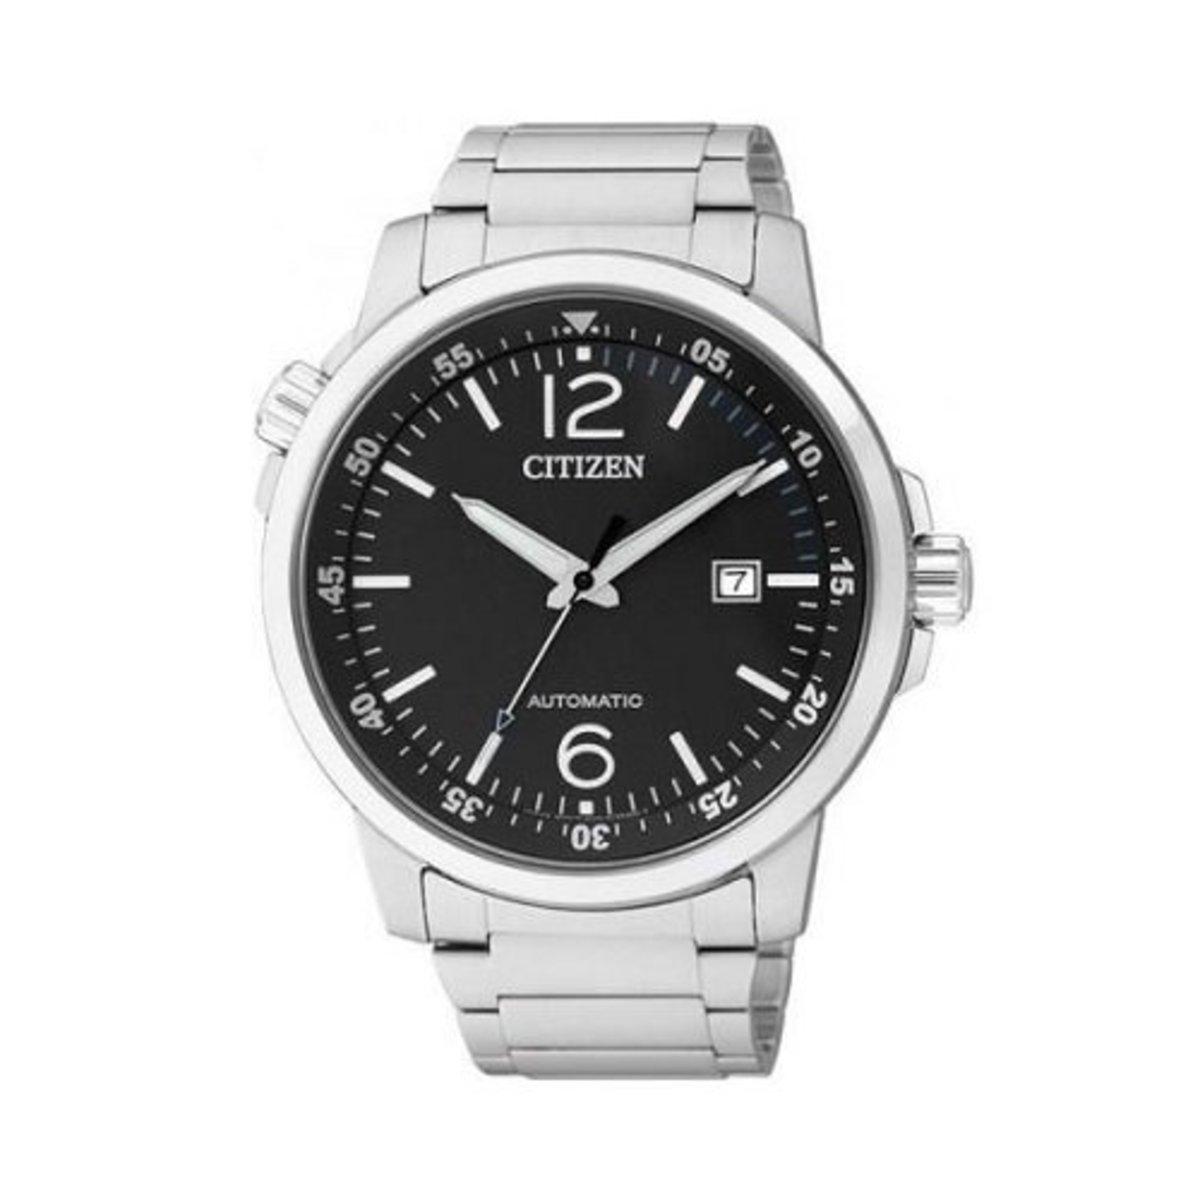 Citizen Gentlemen Mechanical Watch NJ0070-53E  Parallel Import